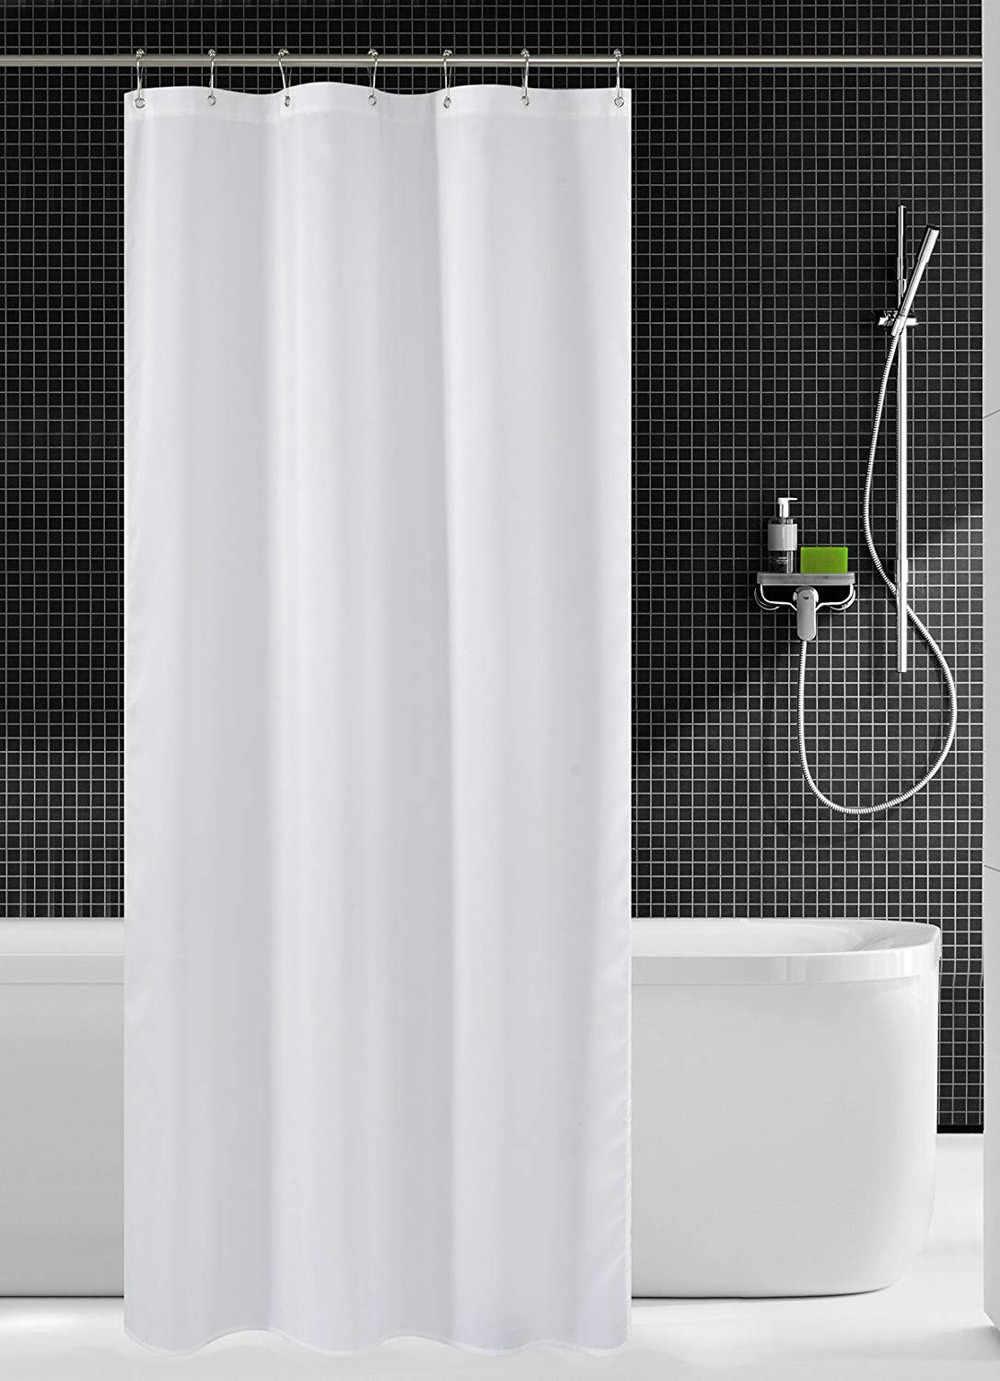 "36X72 ""النسيج دش الستار العفن مقاومة قابل للغسل طارد المياه سبا ستارة حمام اكسسوارات الحمام الديكور"